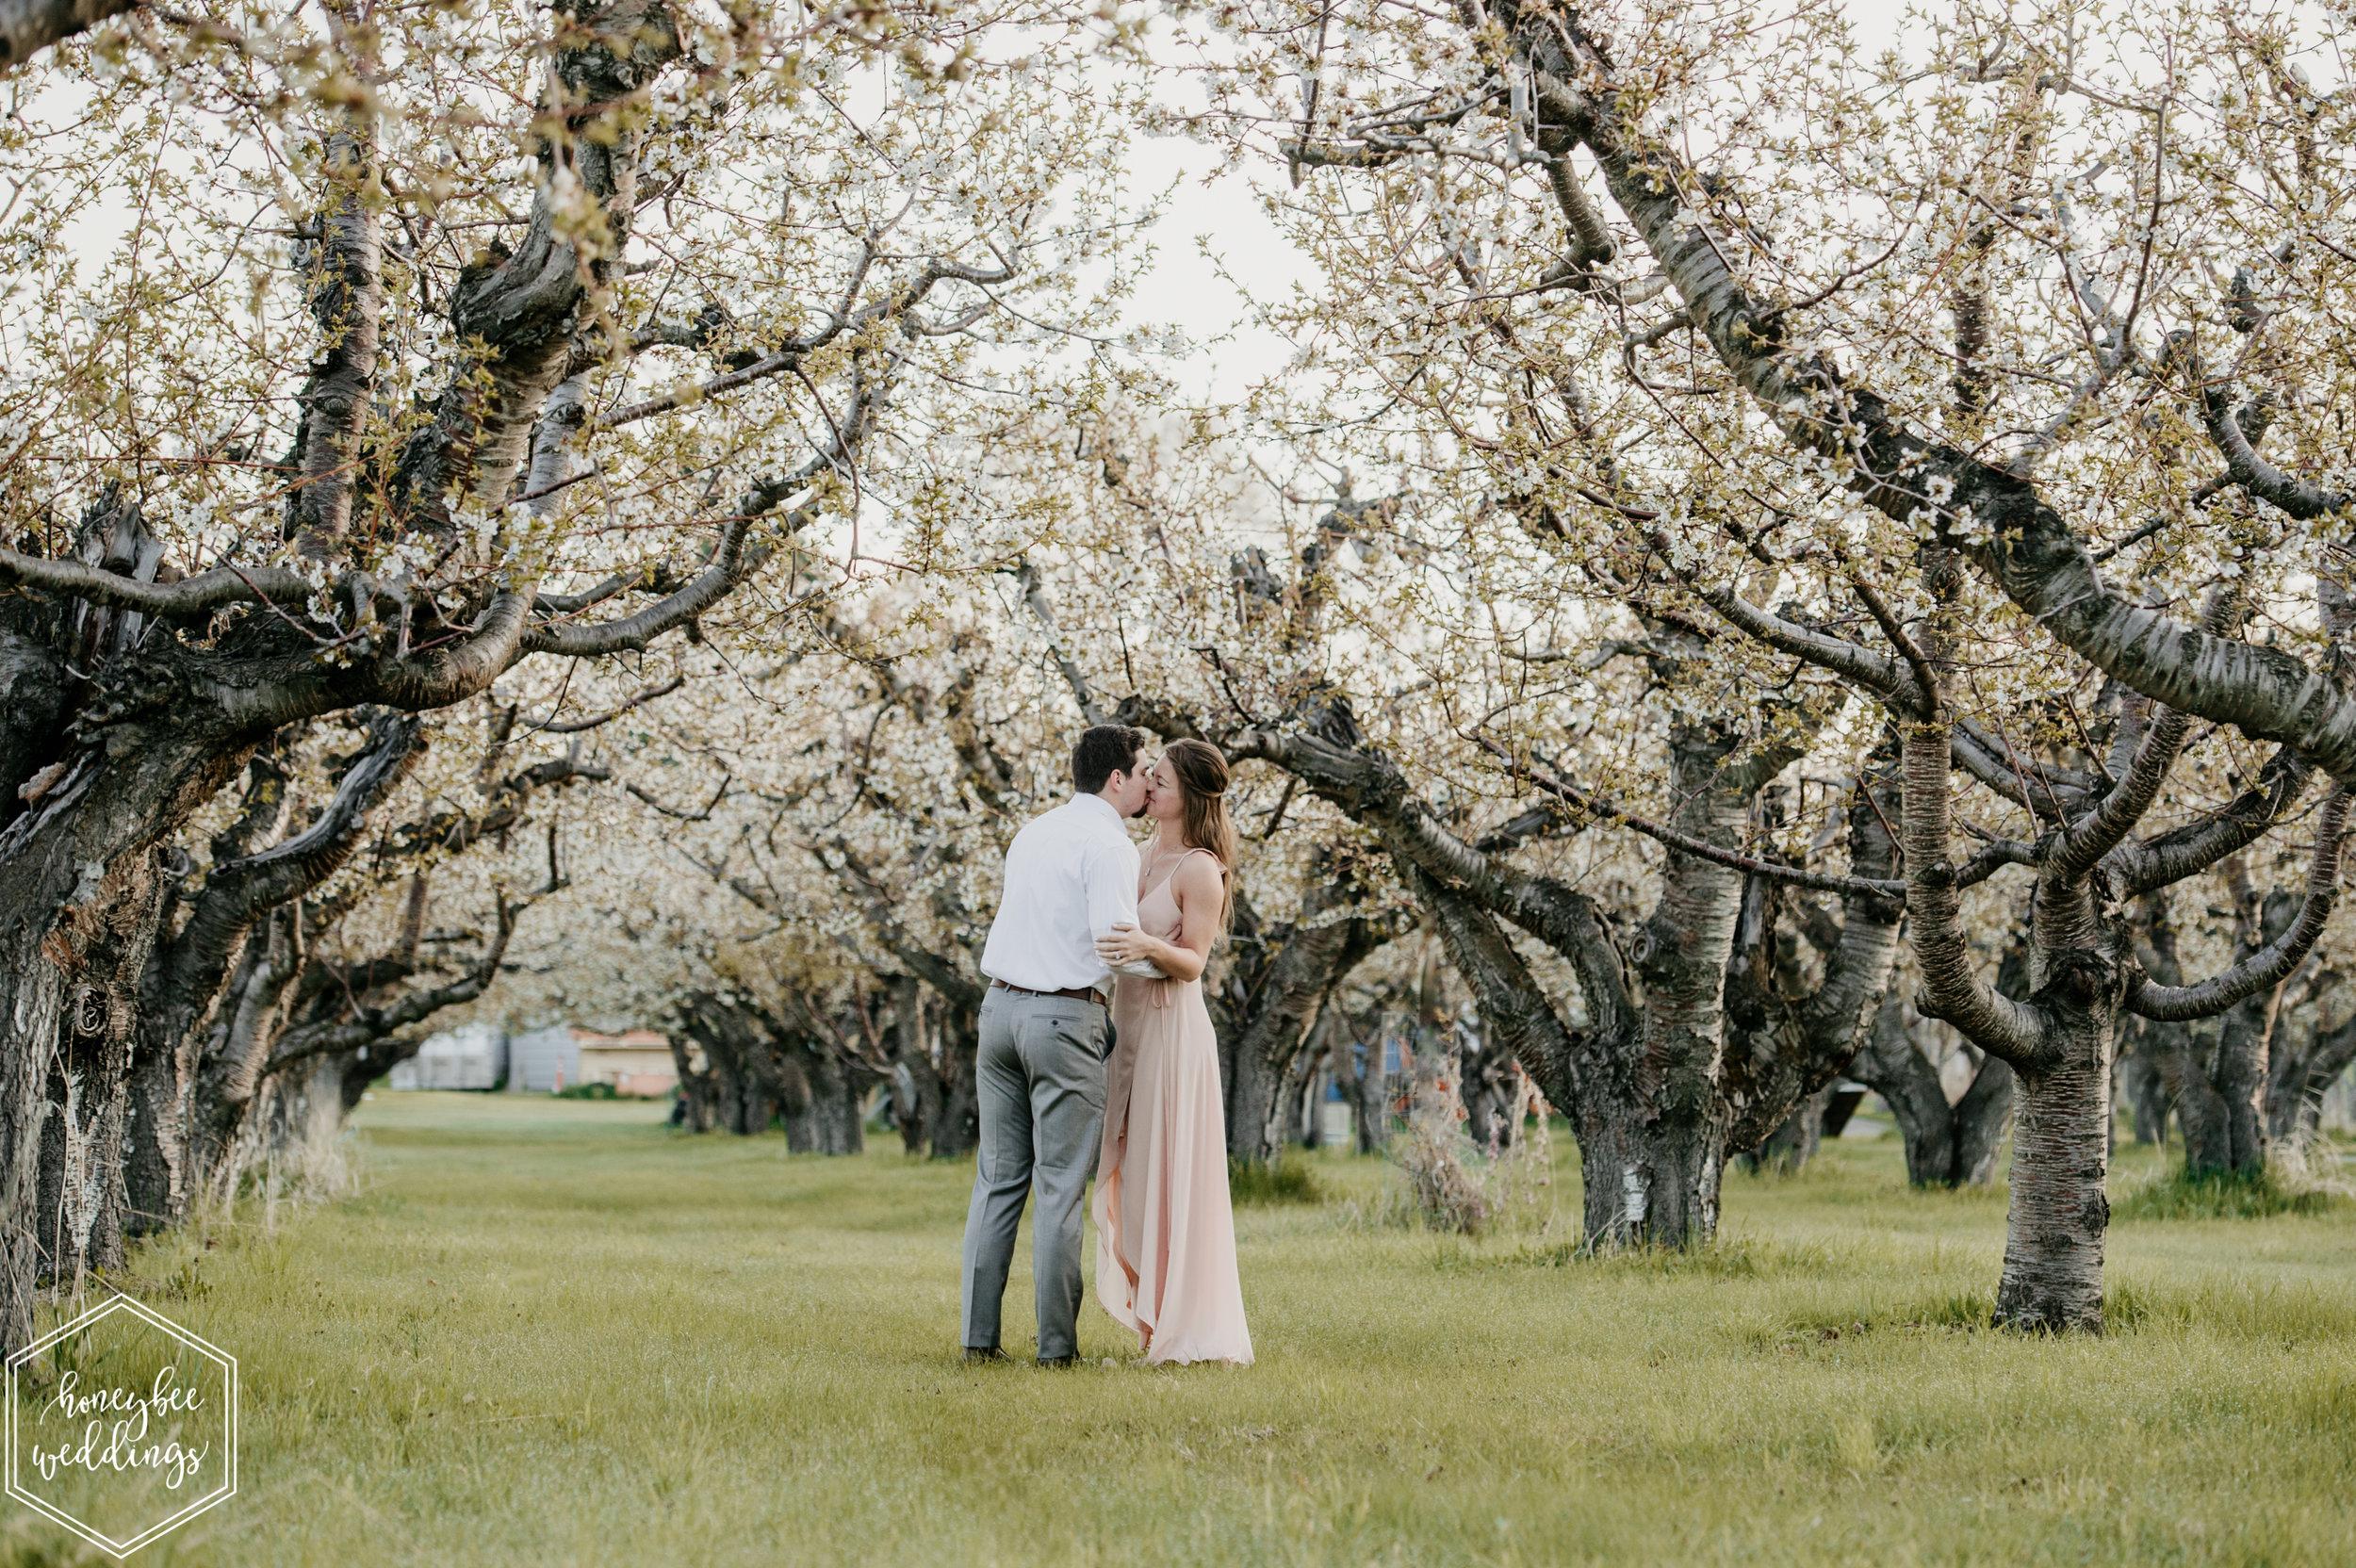 030Montana Wedding Photographer_Cherry Blossom Engagement Session_Ashlin & Luke_Honeybee Weddings_May 11, 2019-28.jpg